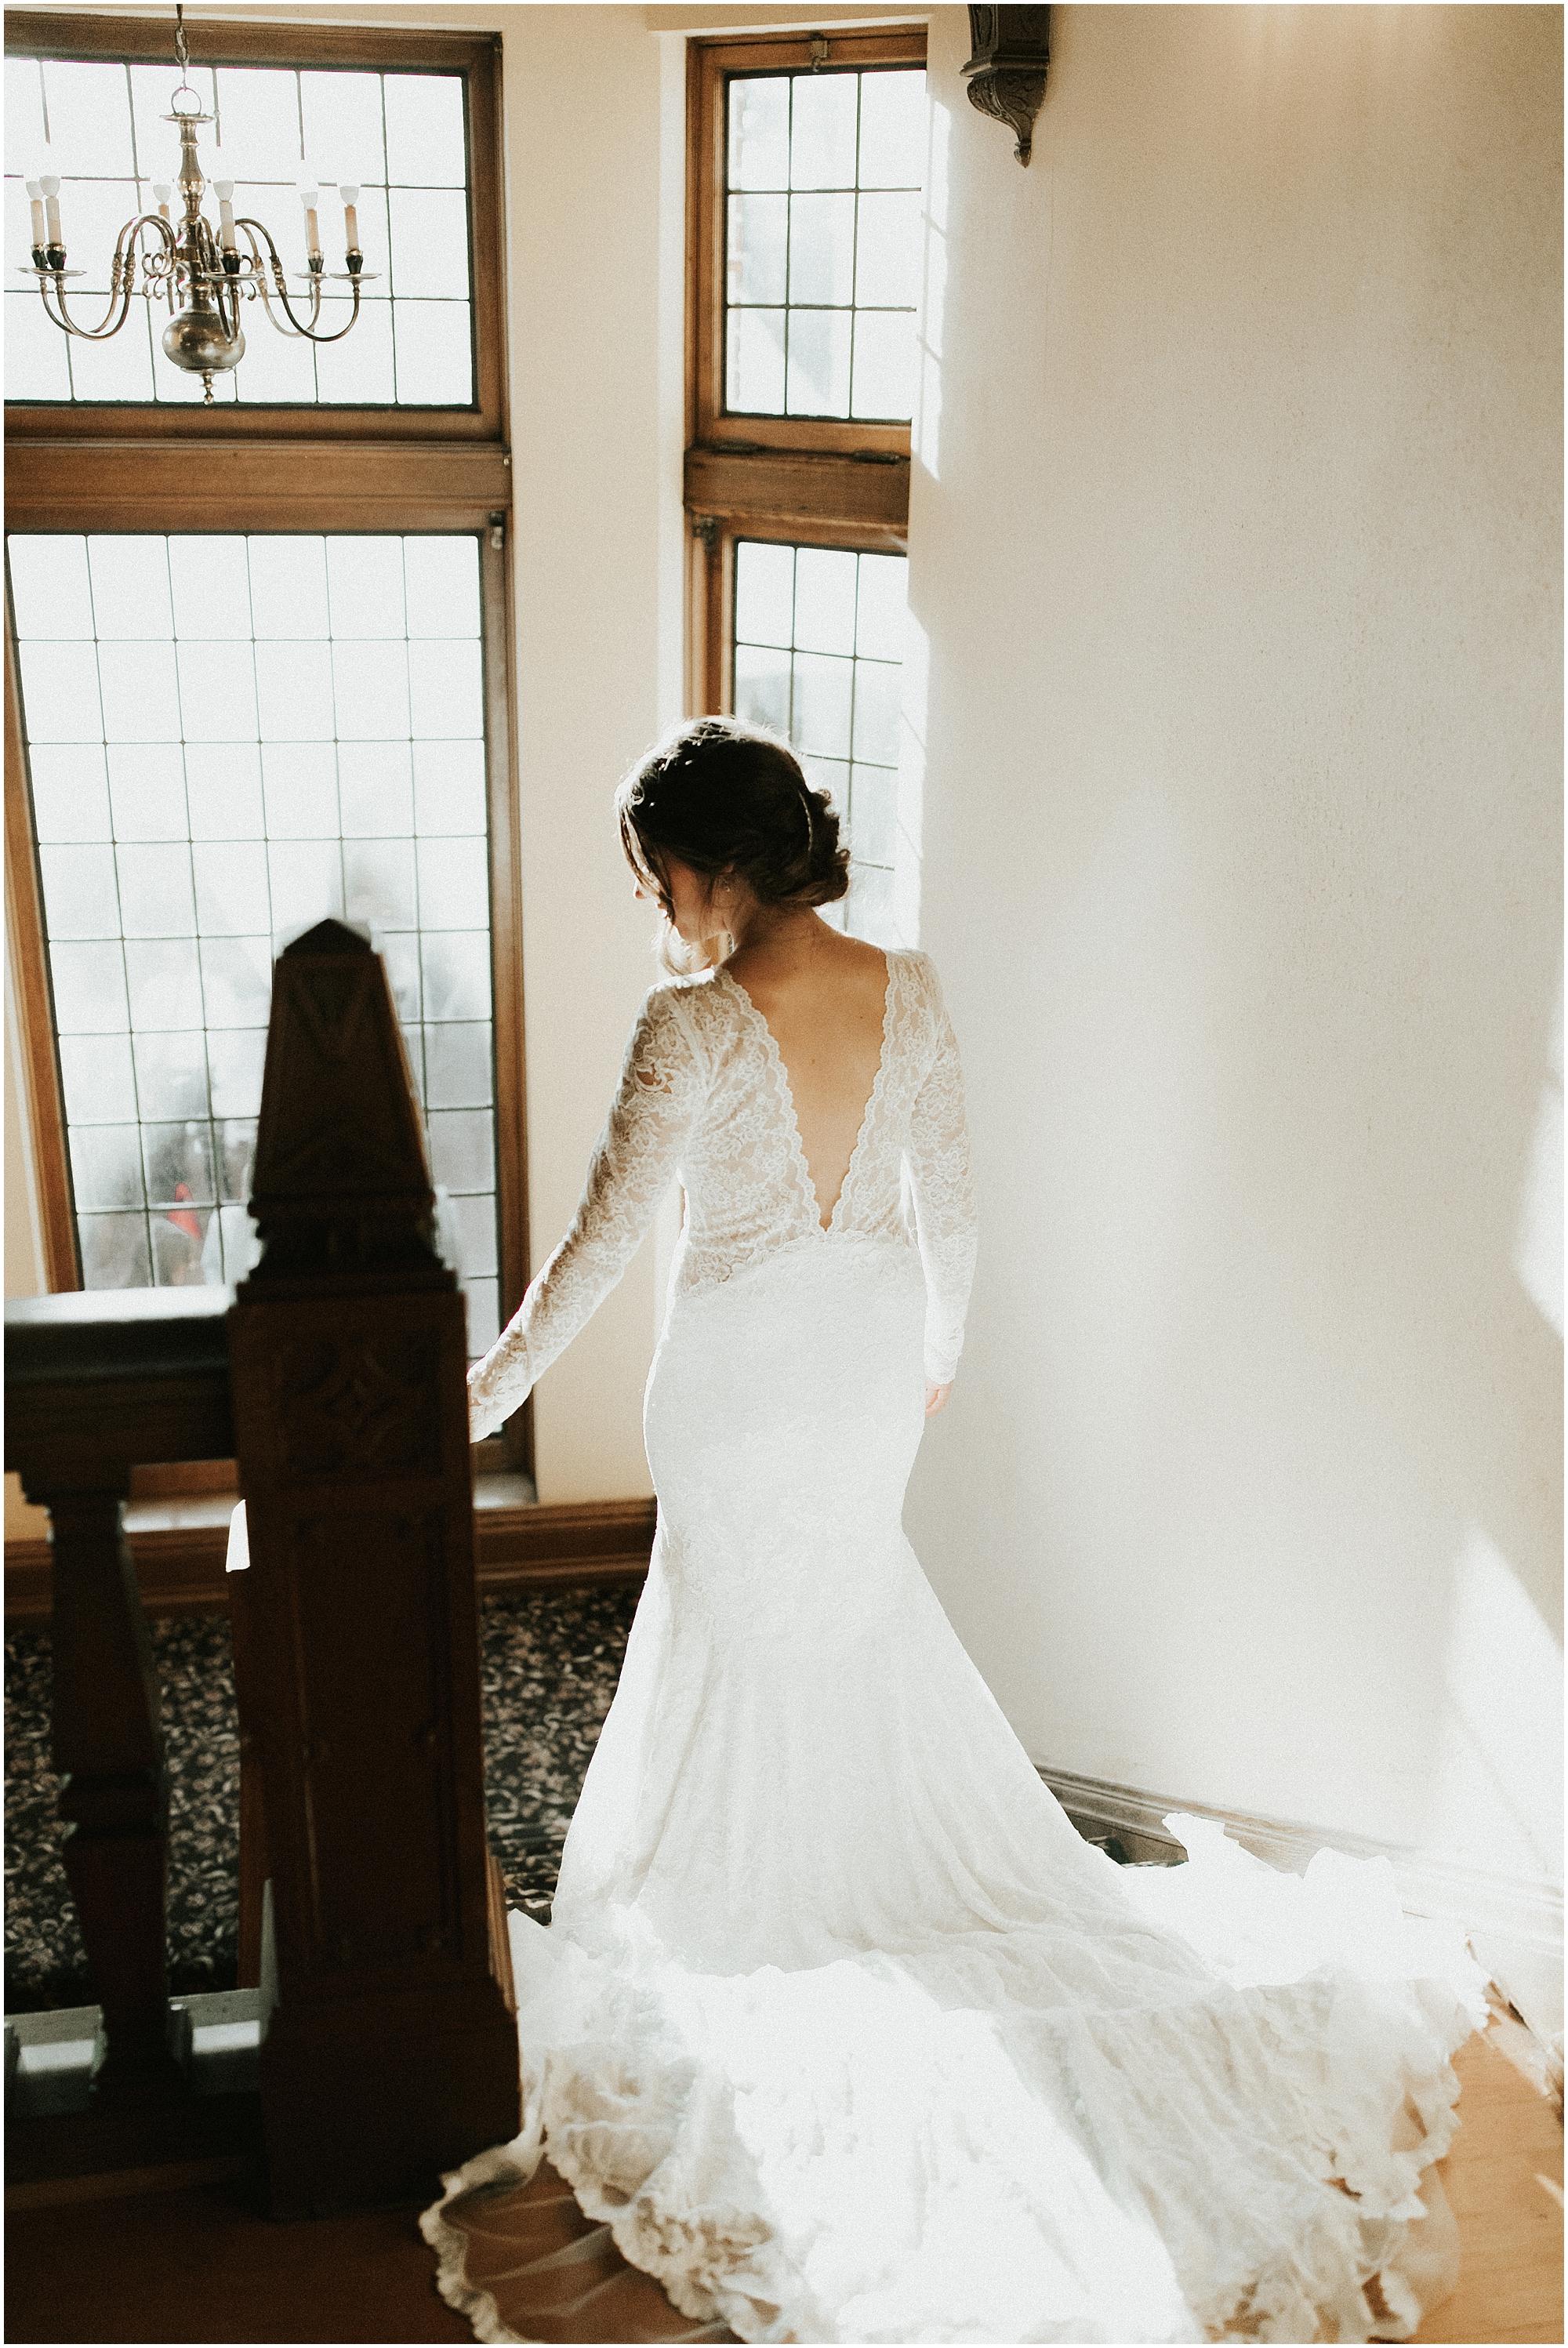 Lairmont Manor Wedding Bellingham Cassie Trottier Photo1106.jpg